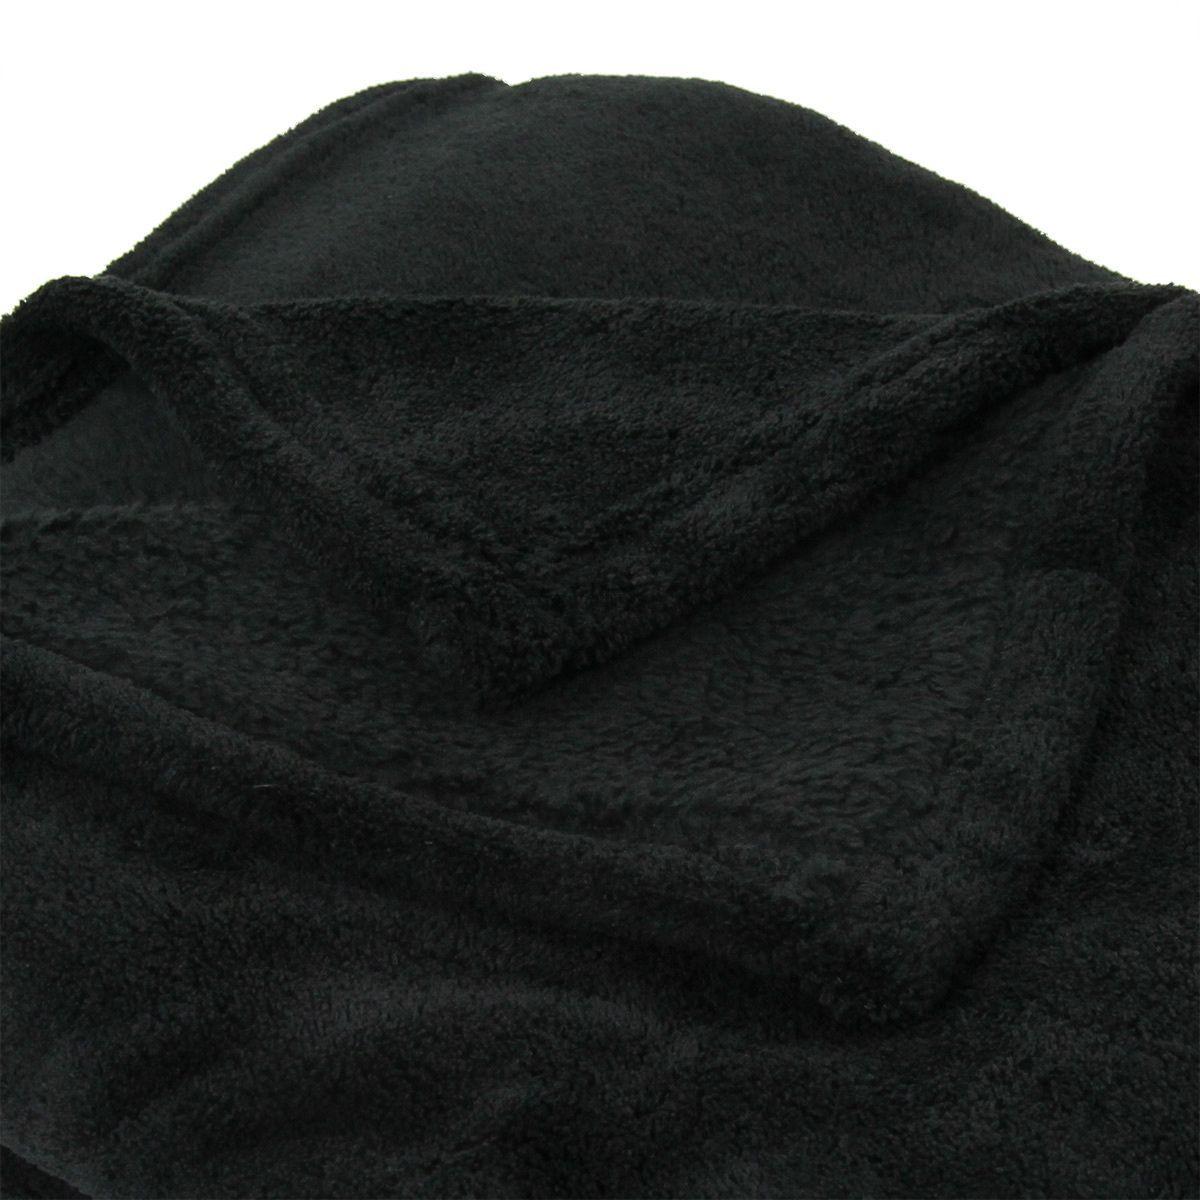 plaid polaire 150 cm tendresse noir plaid cocooning eminza. Black Bedroom Furniture Sets. Home Design Ideas